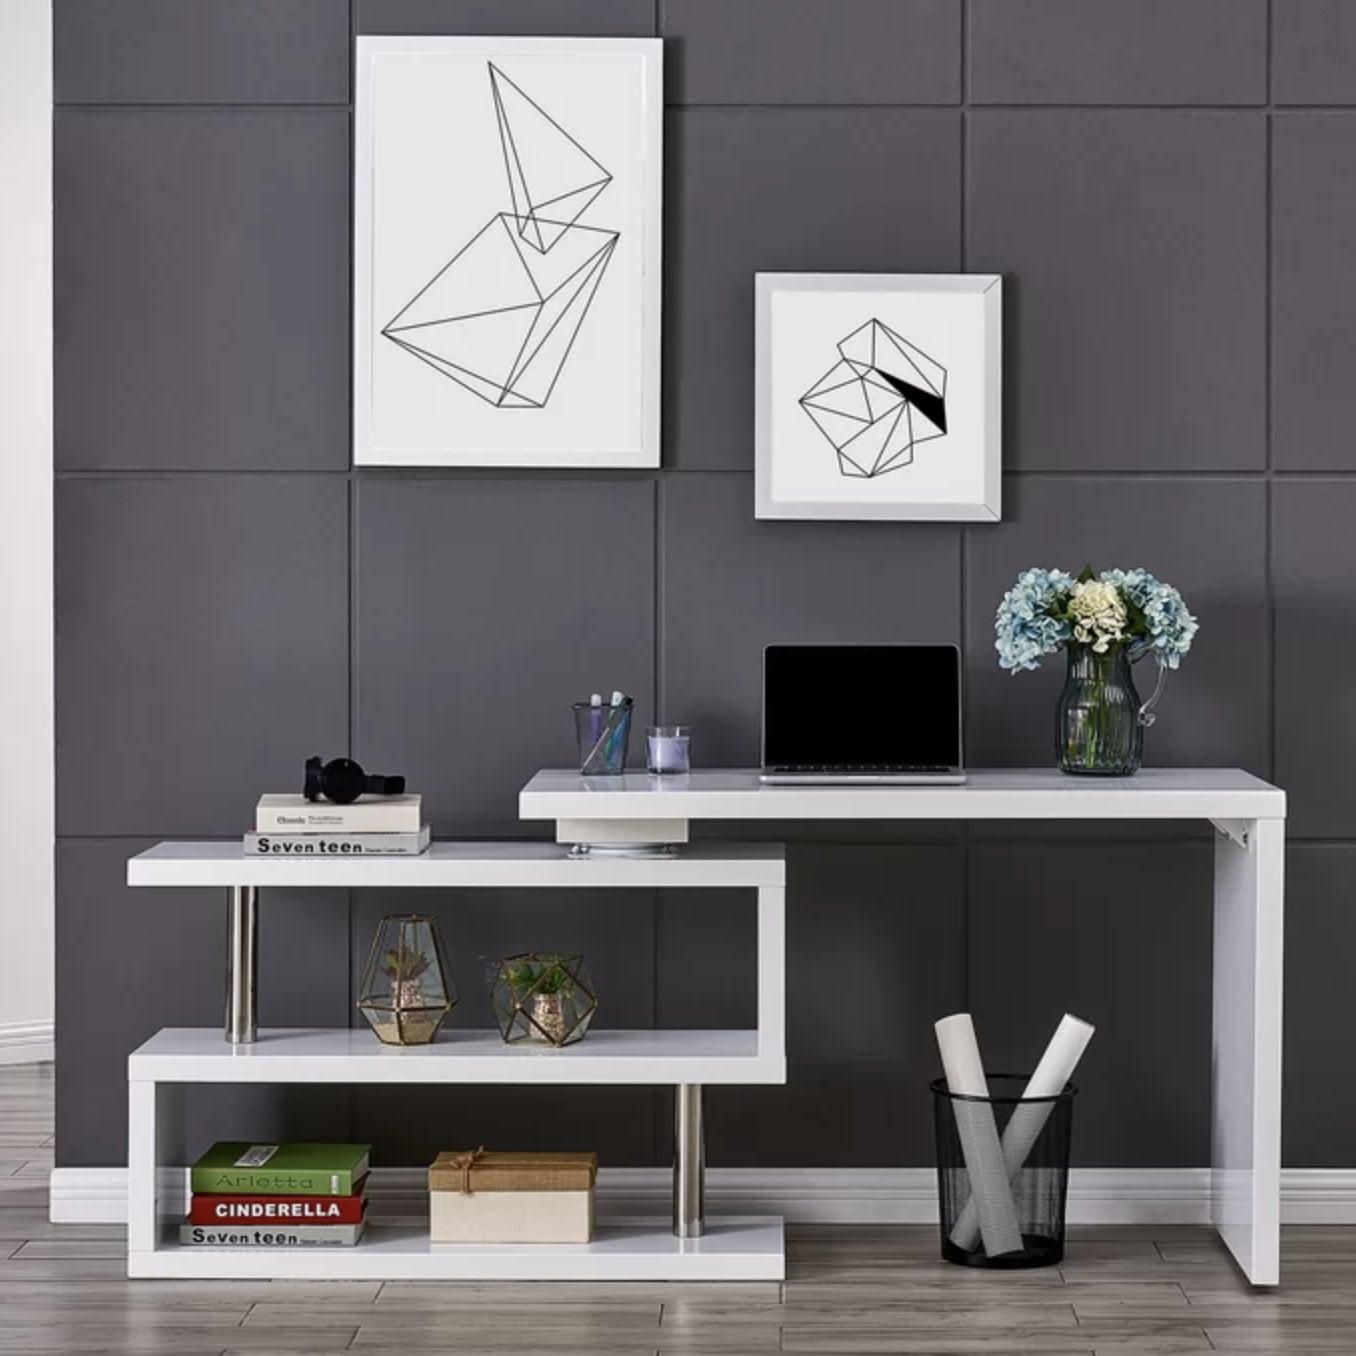 Best Bookshelf That Turns Into A Desk Popsugar Home